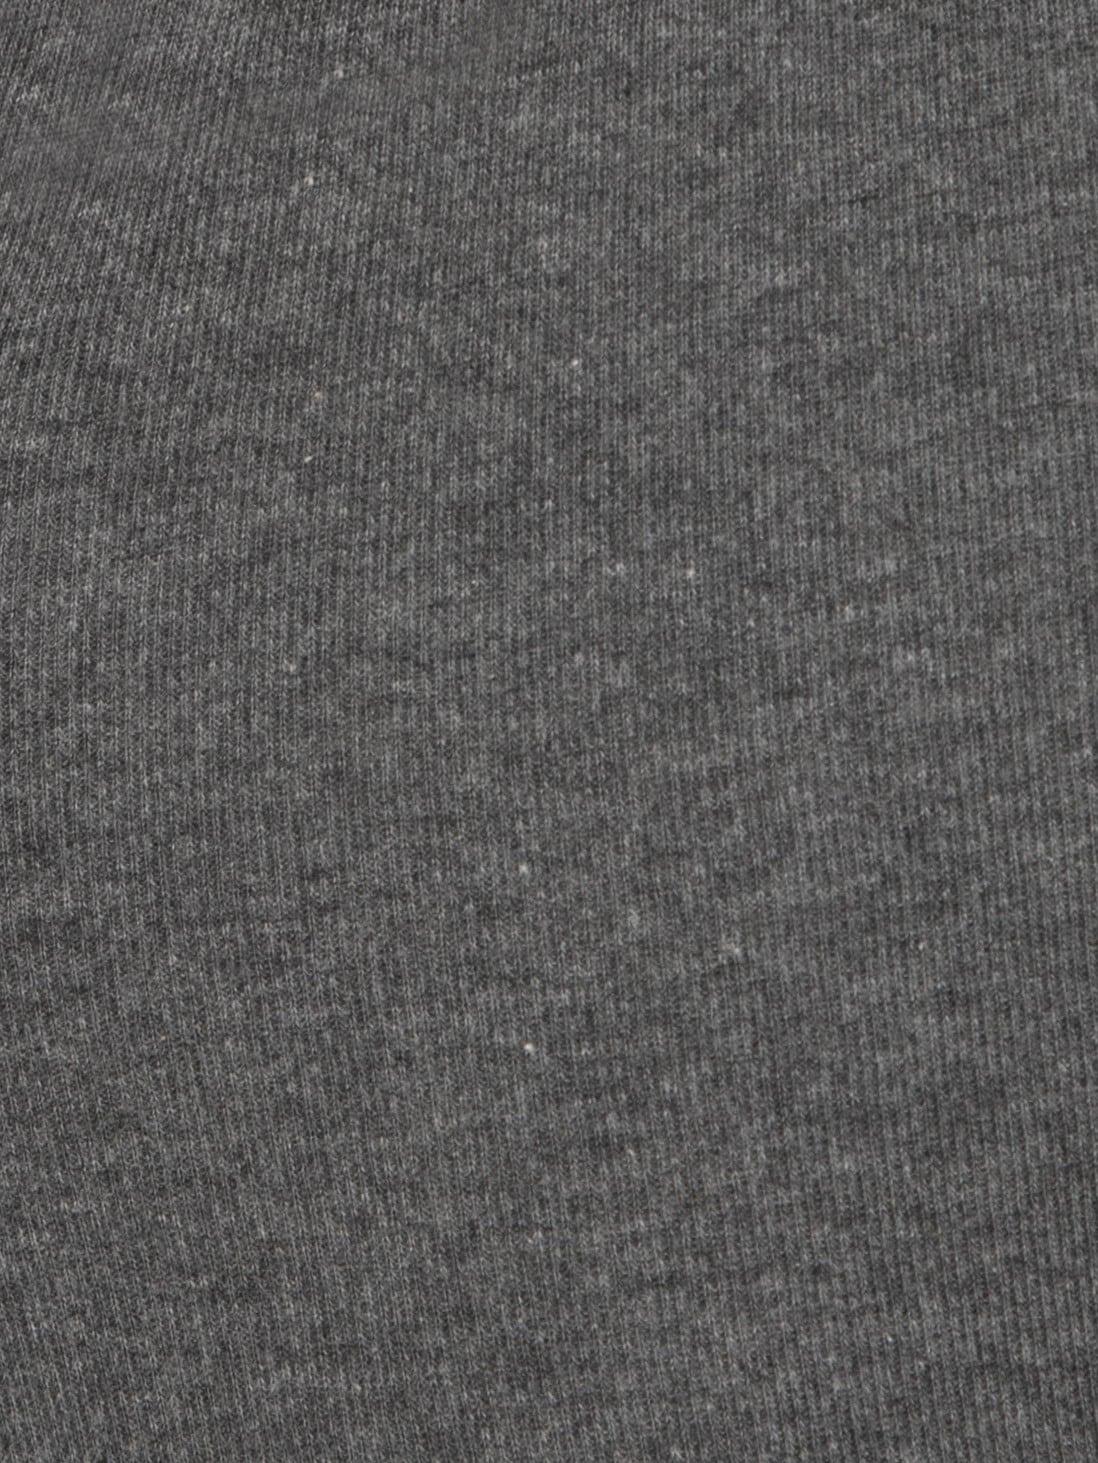 Jockey Men's Charcoal Melange Modern Trunk (Pack Of 2) (XL,Charcoal Melange)